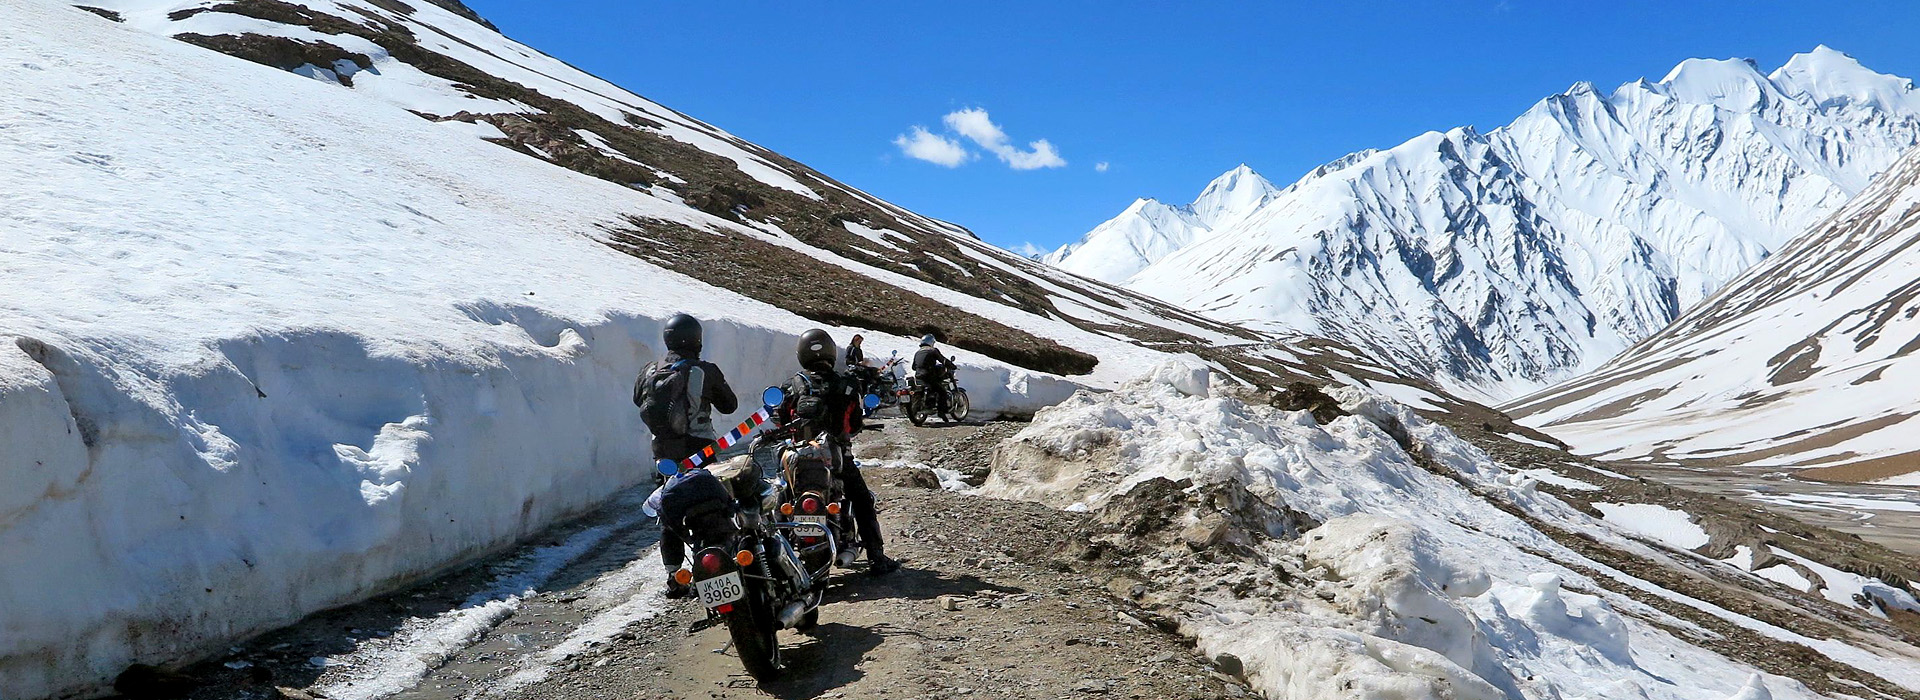 Himalaya motorreizen de 14 daagse Himalaya-Zanskar motorreis van Travel 2 Explore